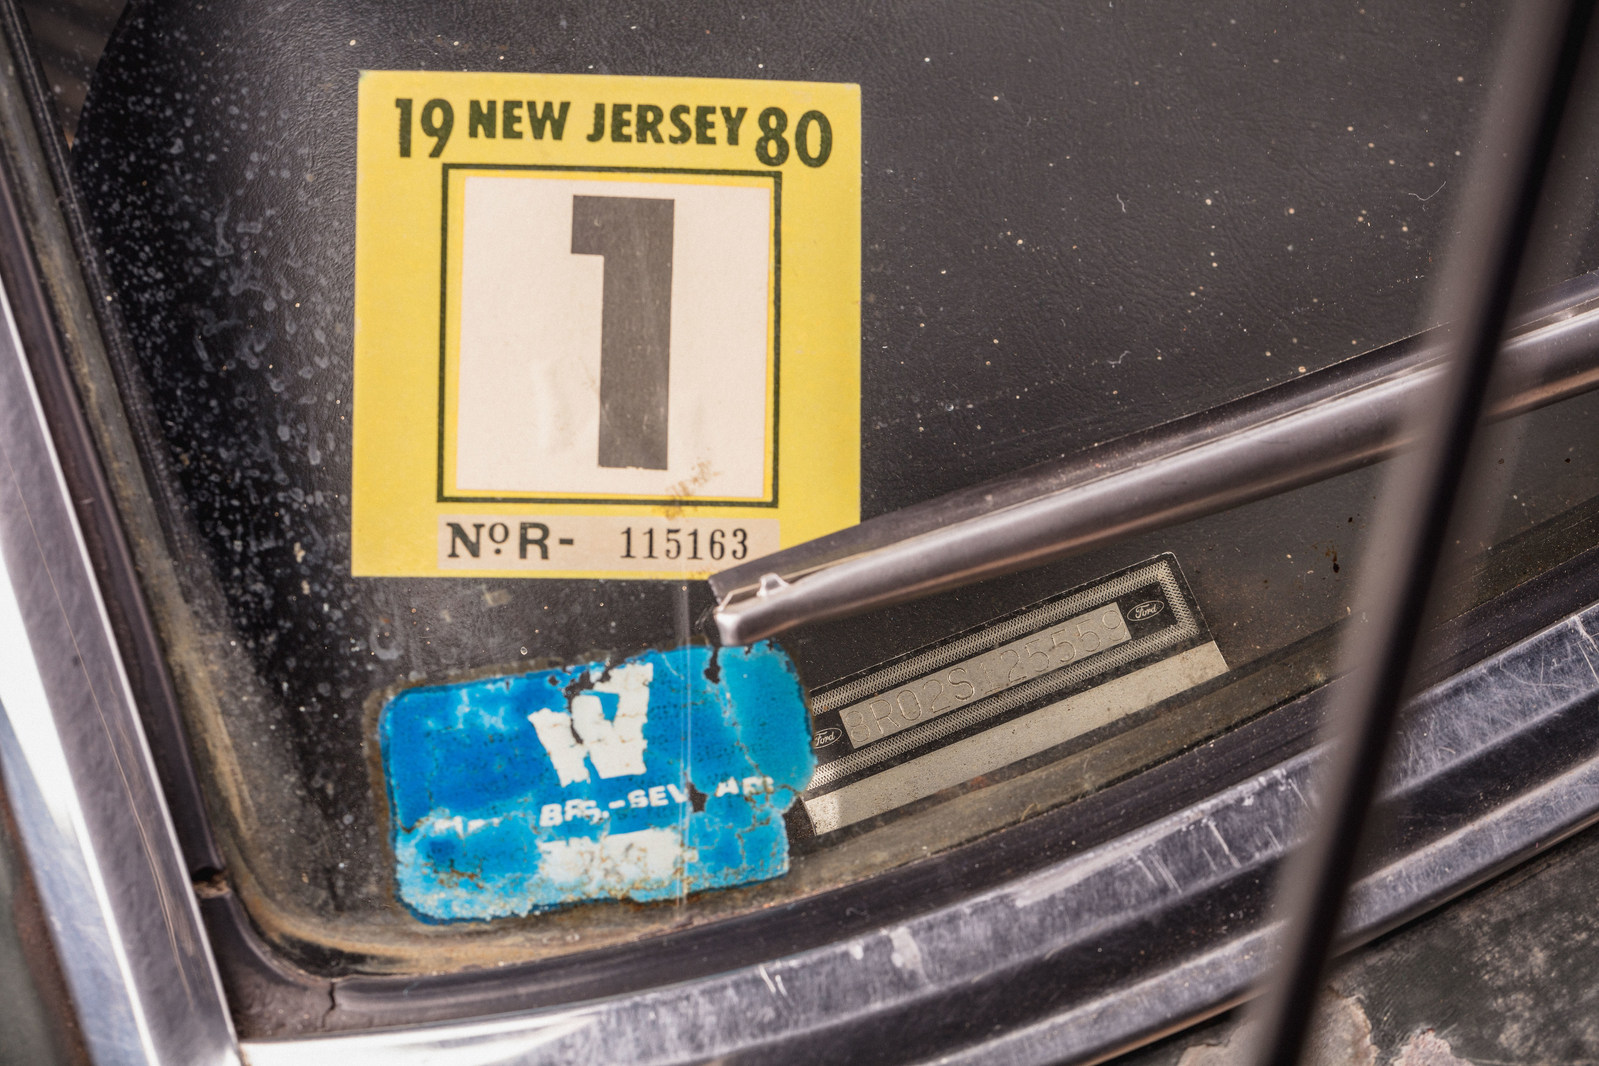 Original Warner Brothers lot sticker on 1968 Mustang '559 used in movie Bullitt